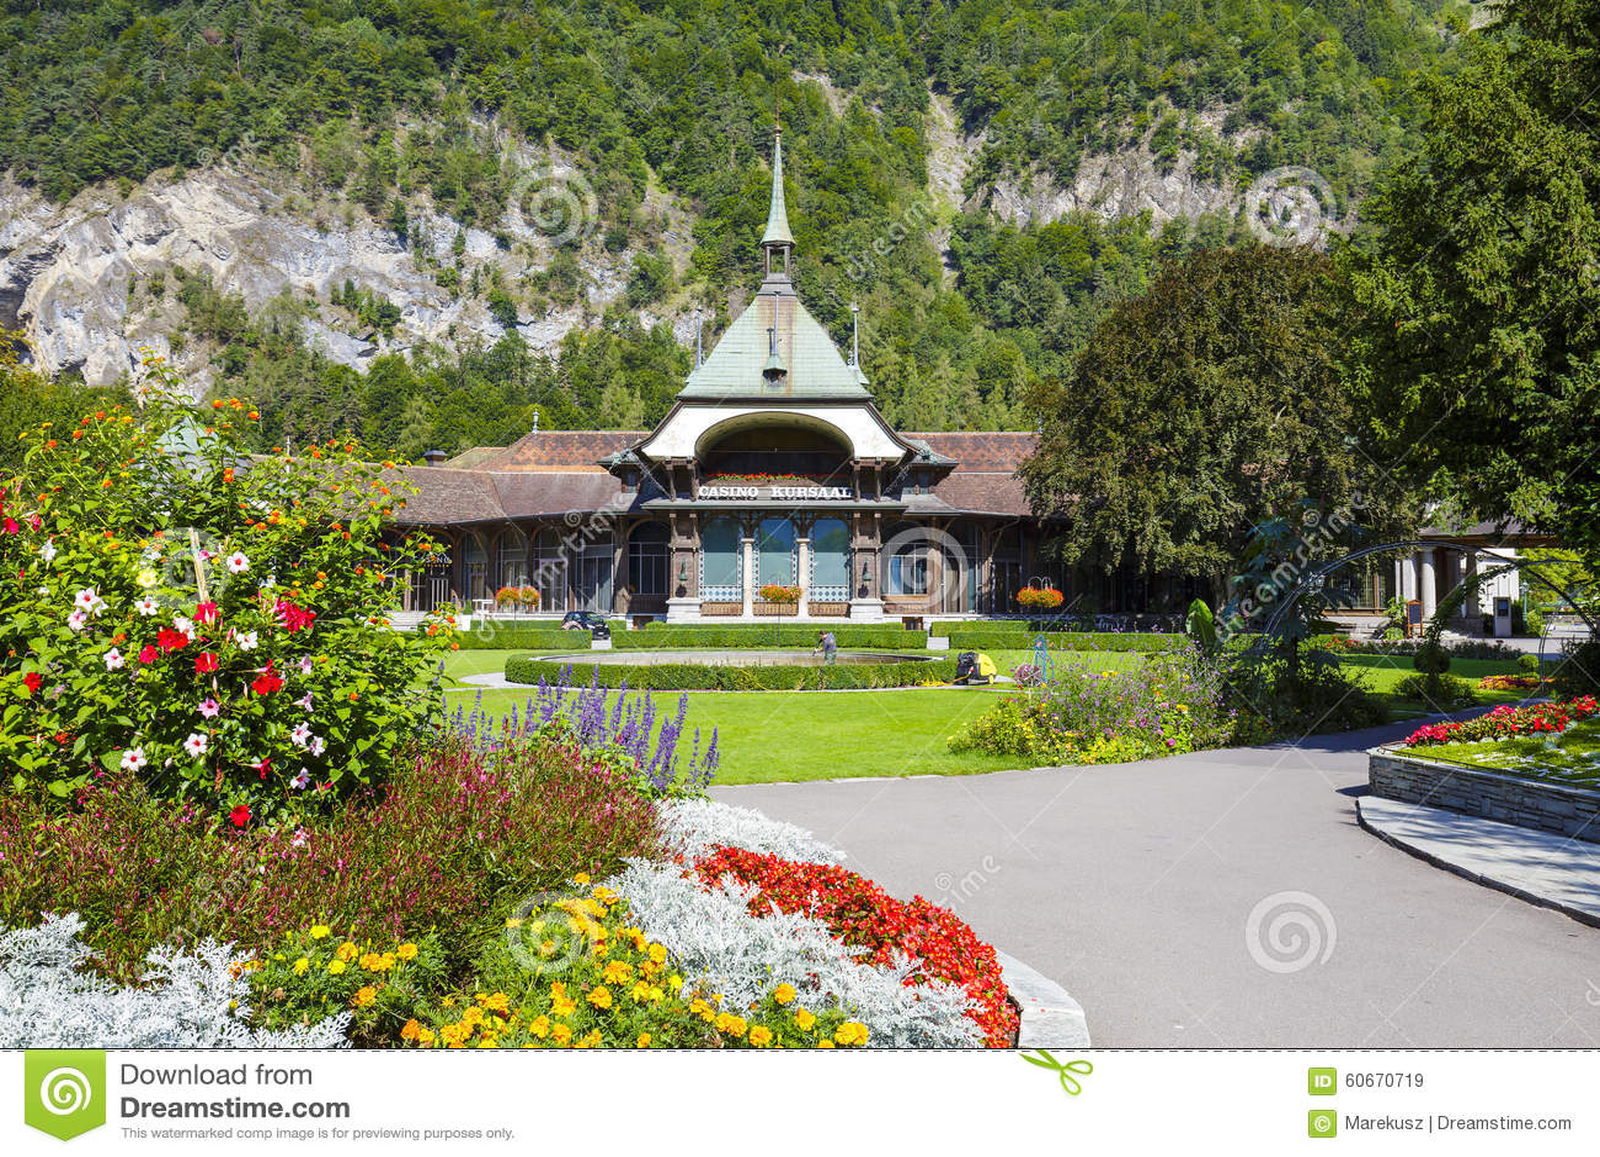 Casino kursaal interlaken switzerland